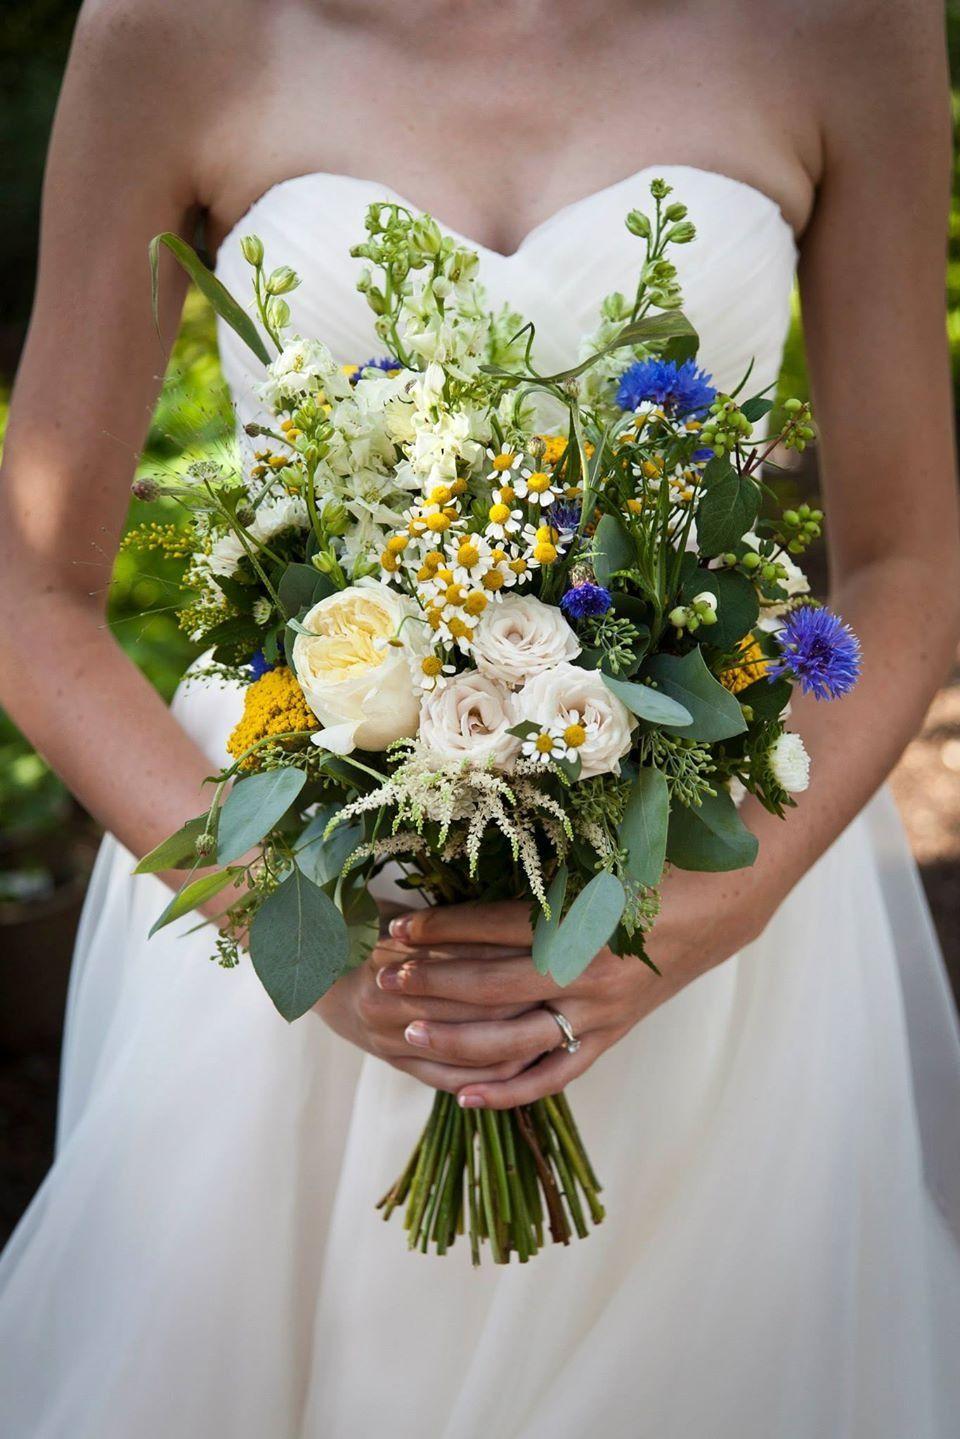 Wedding at the Saskatoon Farm, photography by Britta Kokemor, flowers by Amborella Floral Studio. <3